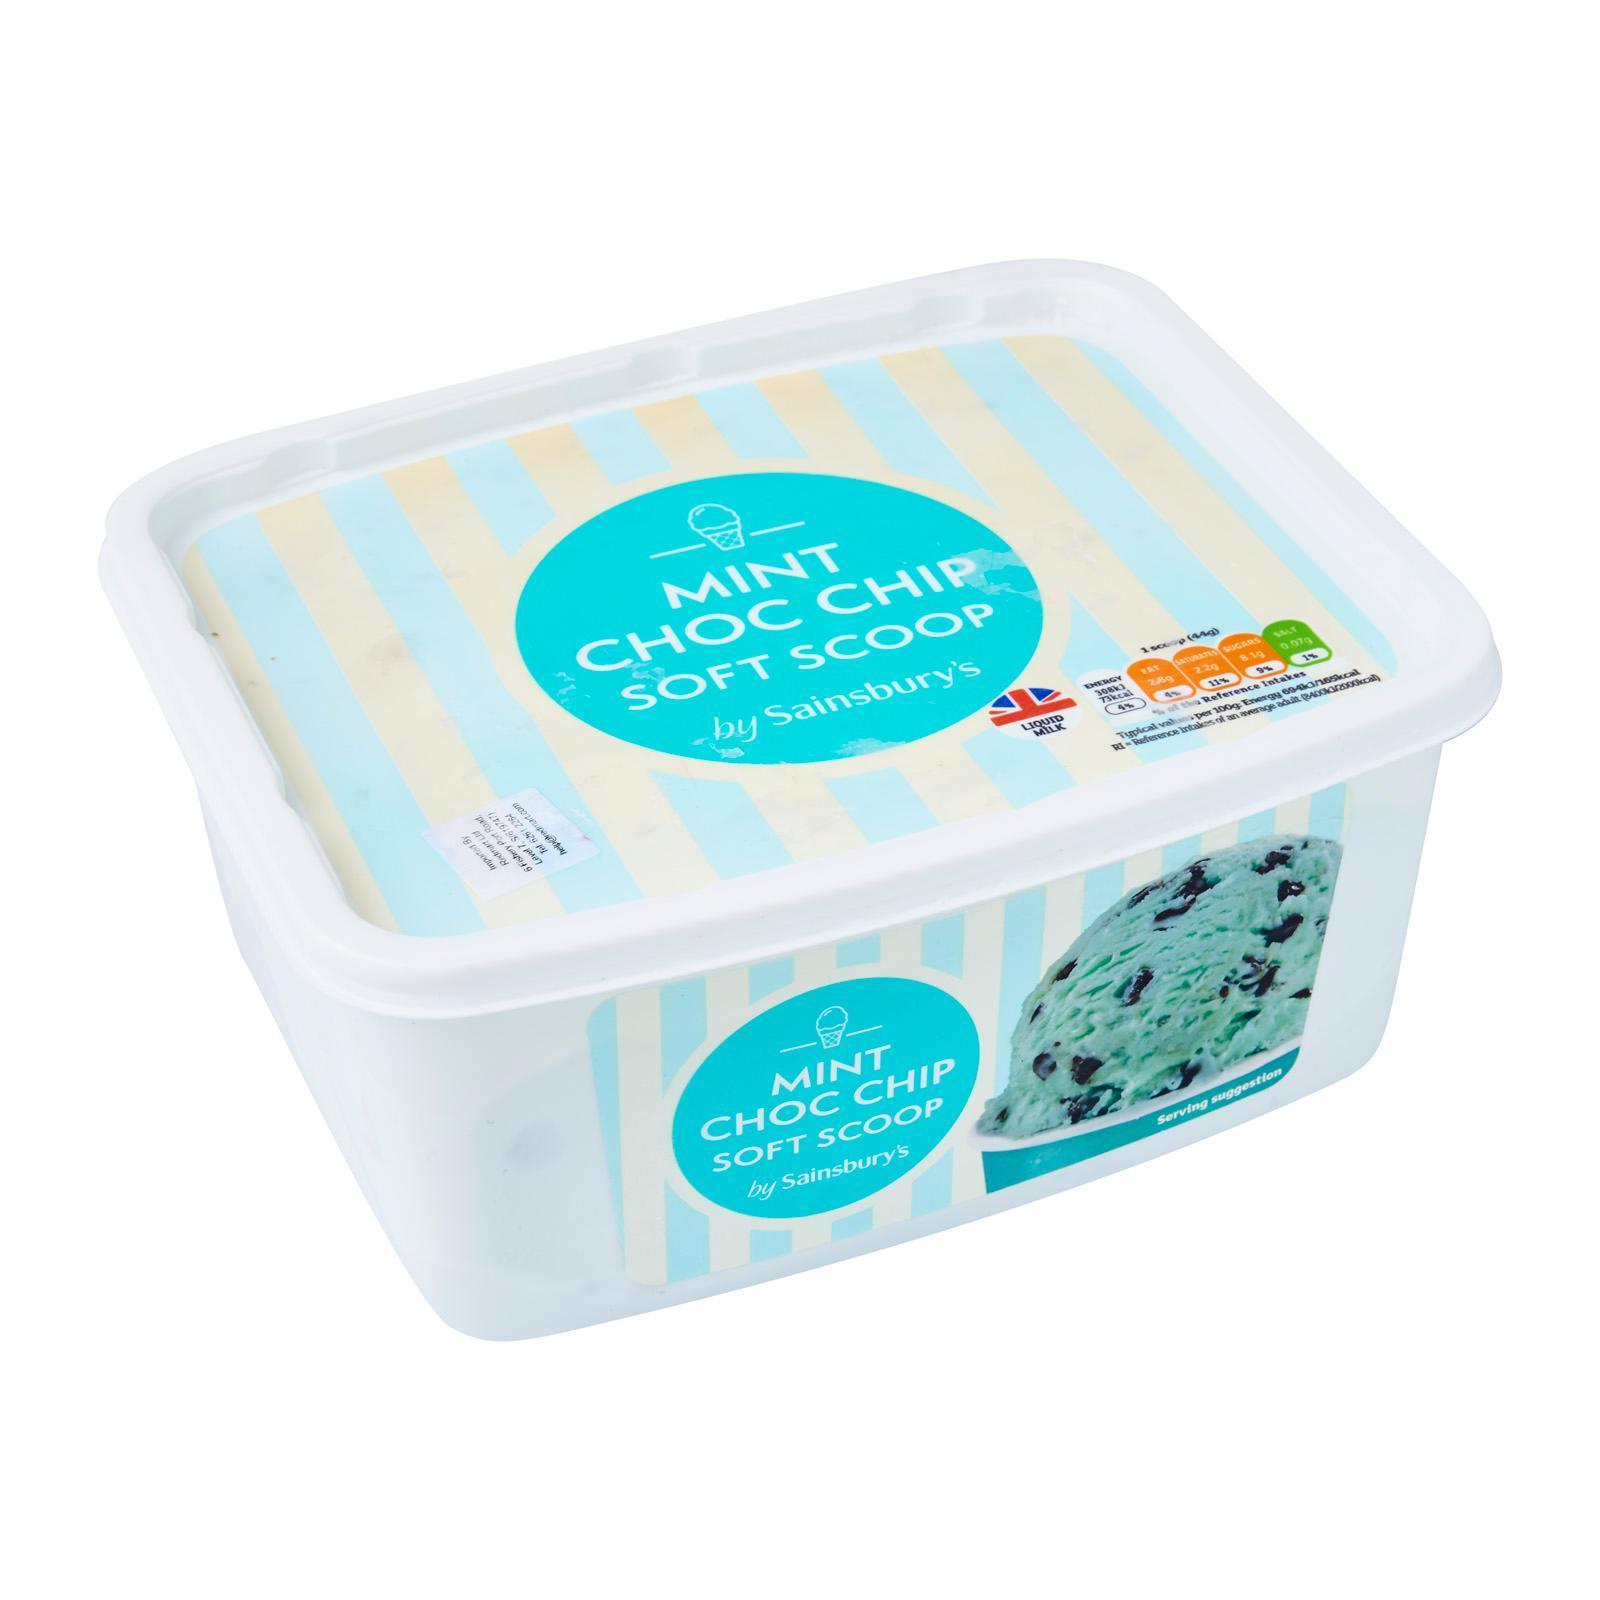 Sainsbury's Mint Choc Chip Ice Cream - Frozen